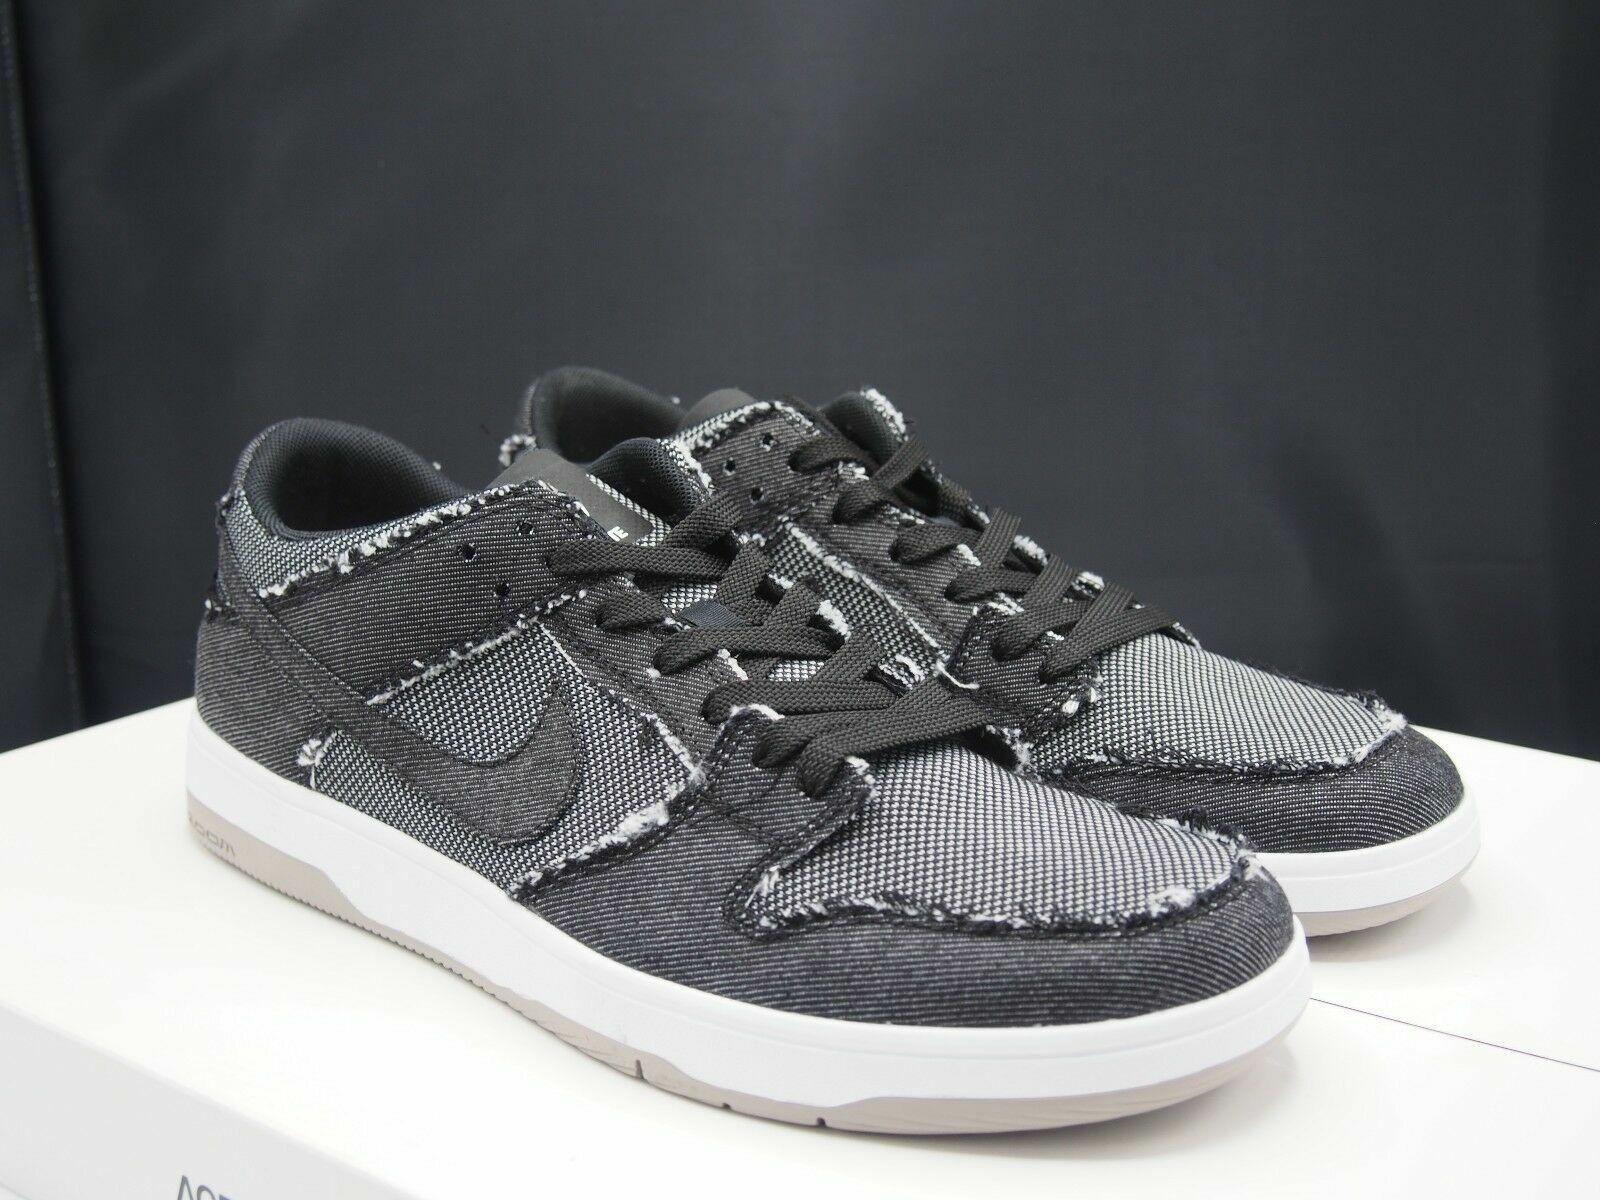 best service a1a91 dc080 Nike SB Dunk Low Elite Medicom Bearbrick Black Medium Gray Size 10.5